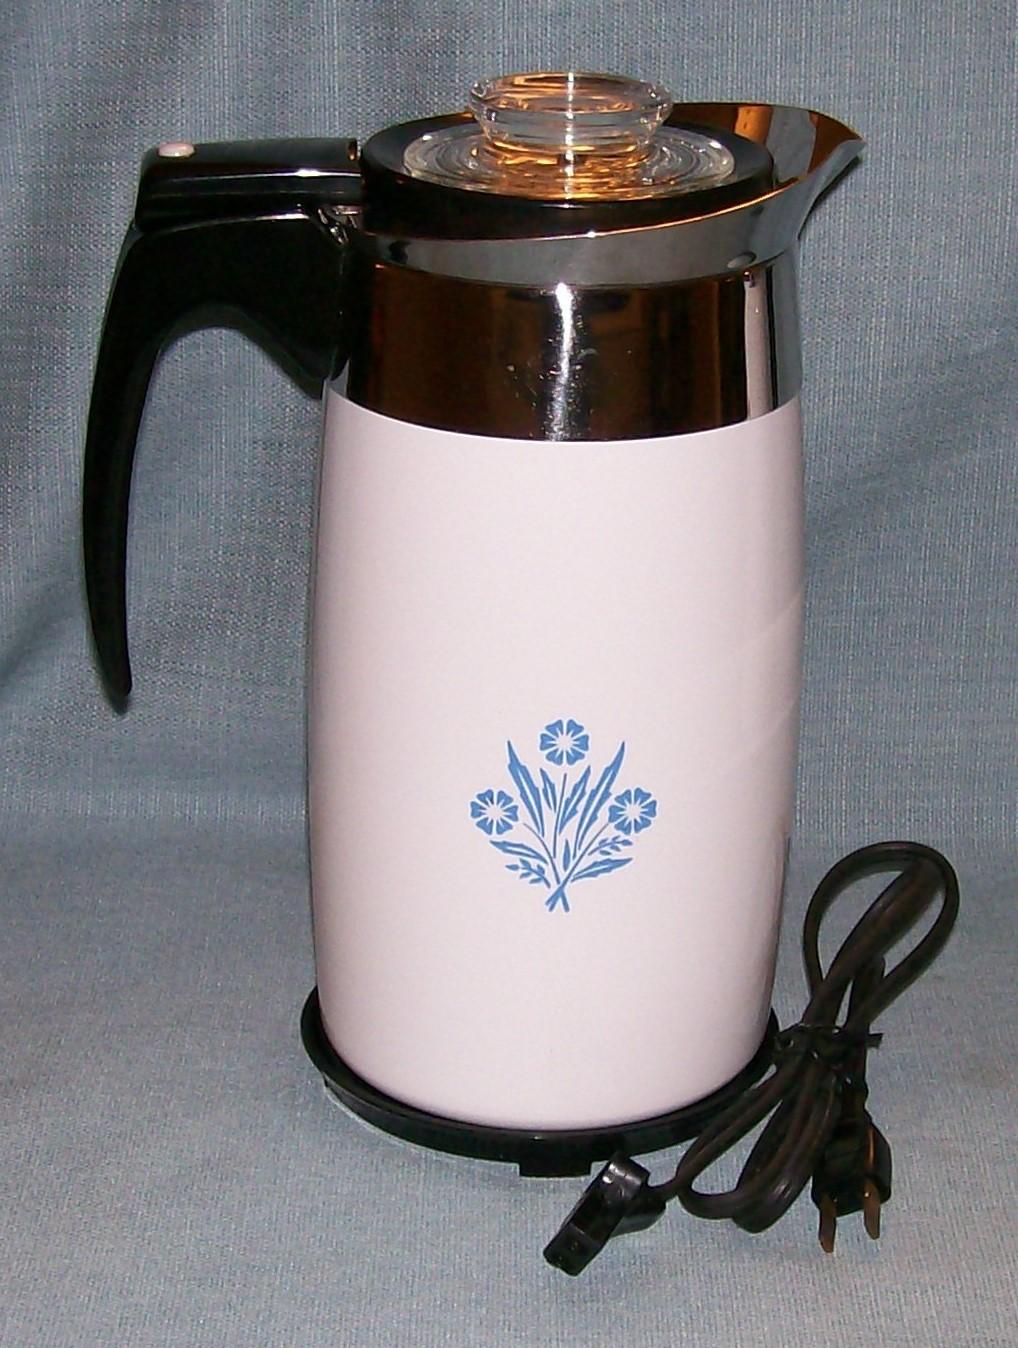 Corning Ware BLUE CORNFLOWER Electric Coffee Pot/Percolator 10 cup P-80-EP EUVC